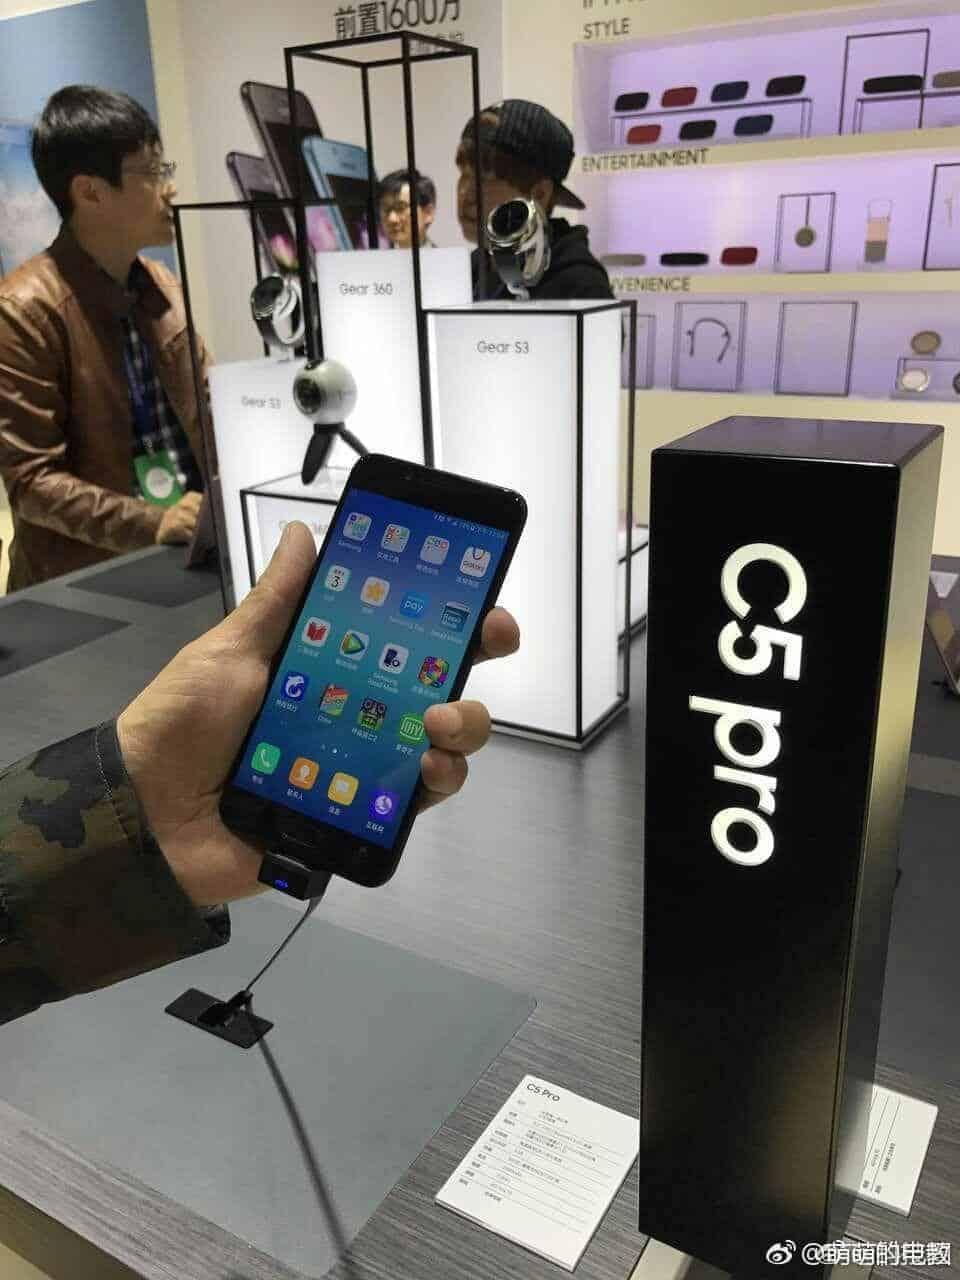 Samsung Galaxy C5 Pro Jet Black 4